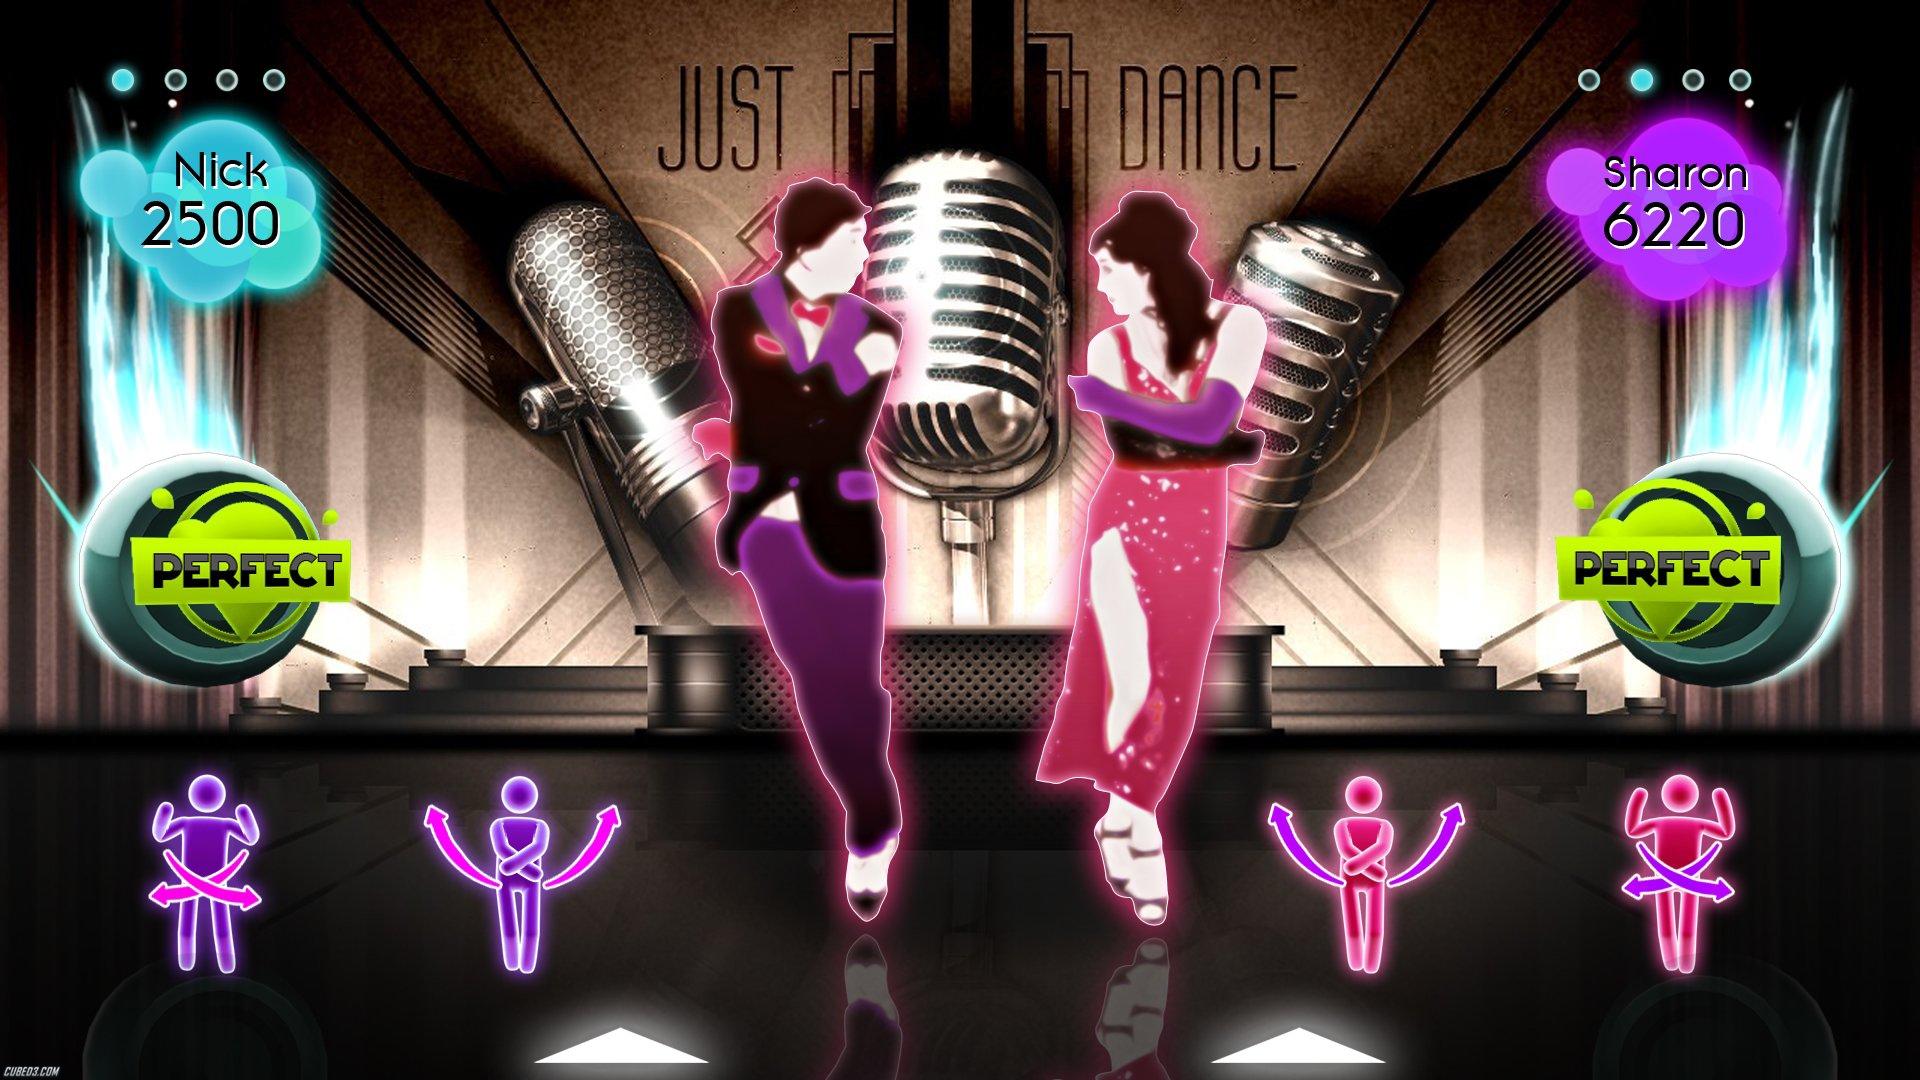 Screens Zimmer 7 angezeig: just dance download